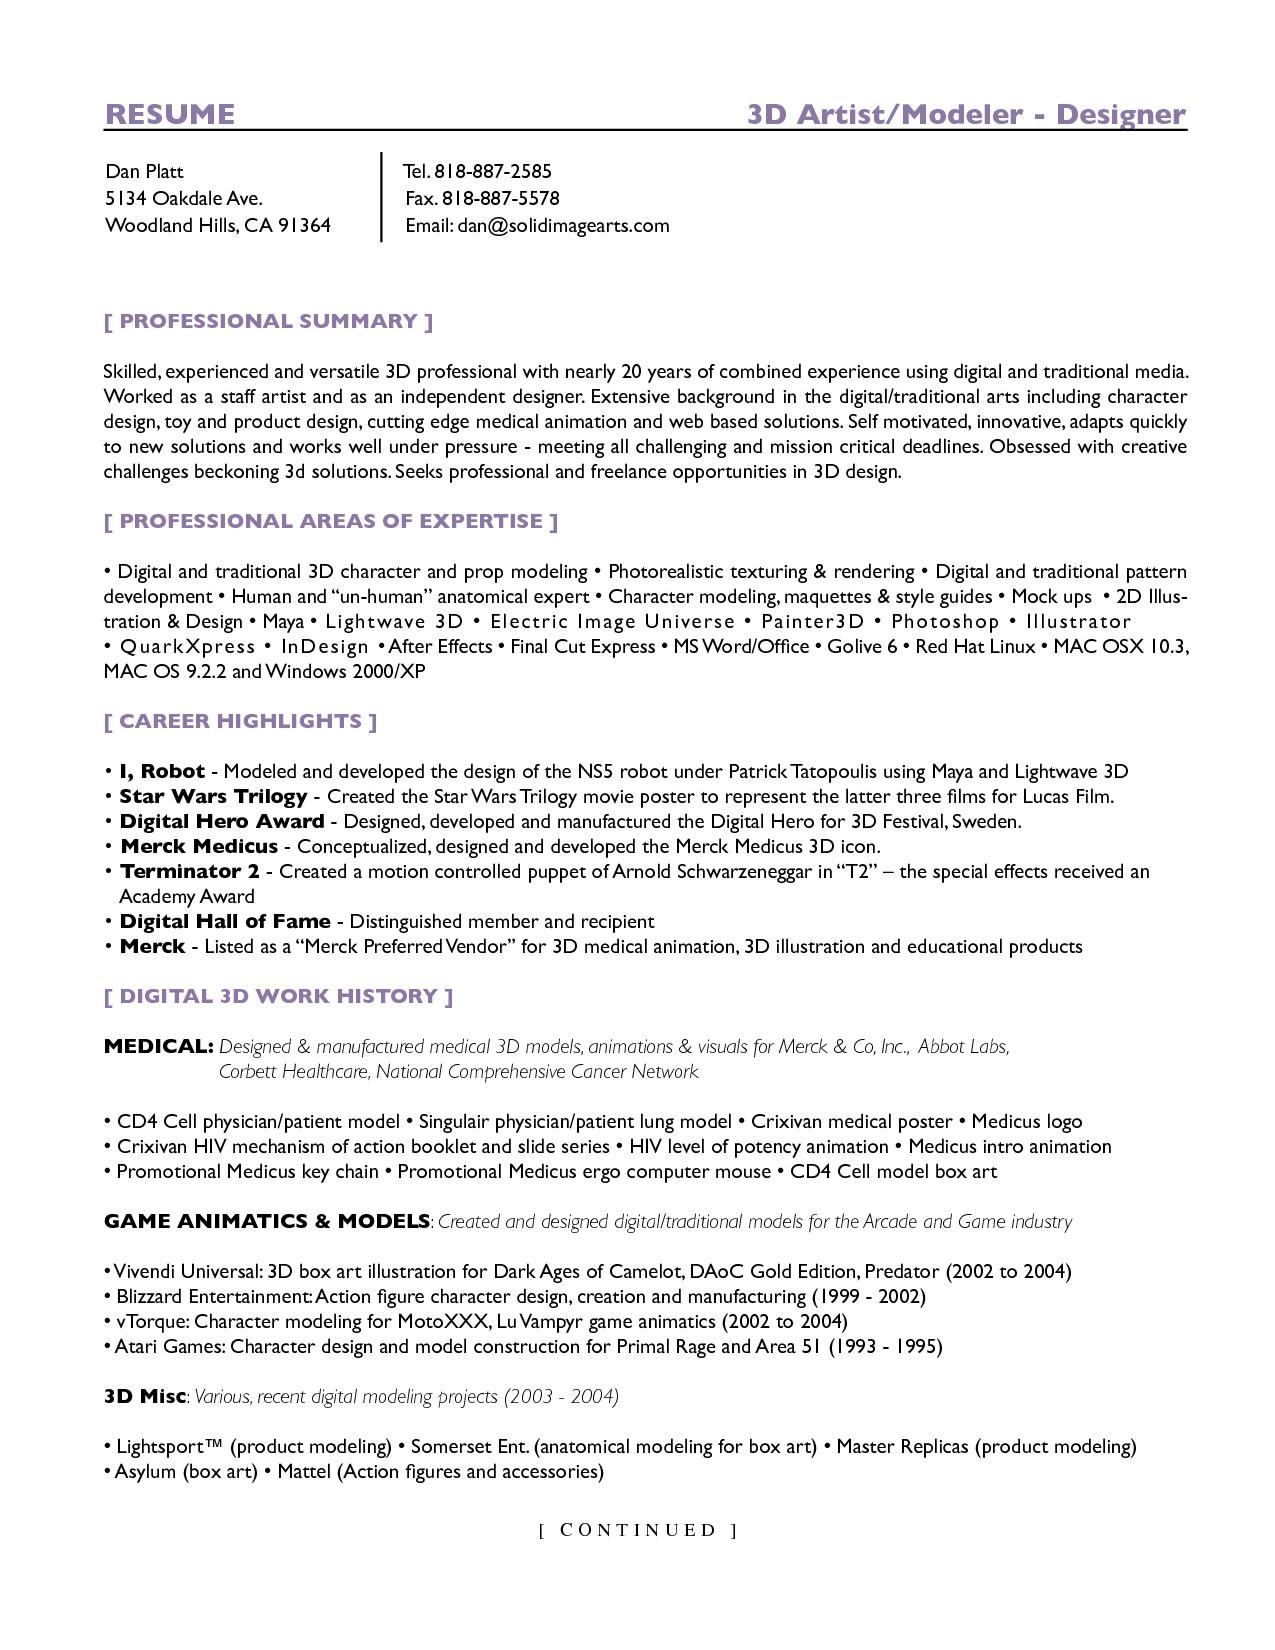 Resume Format 3D Artist